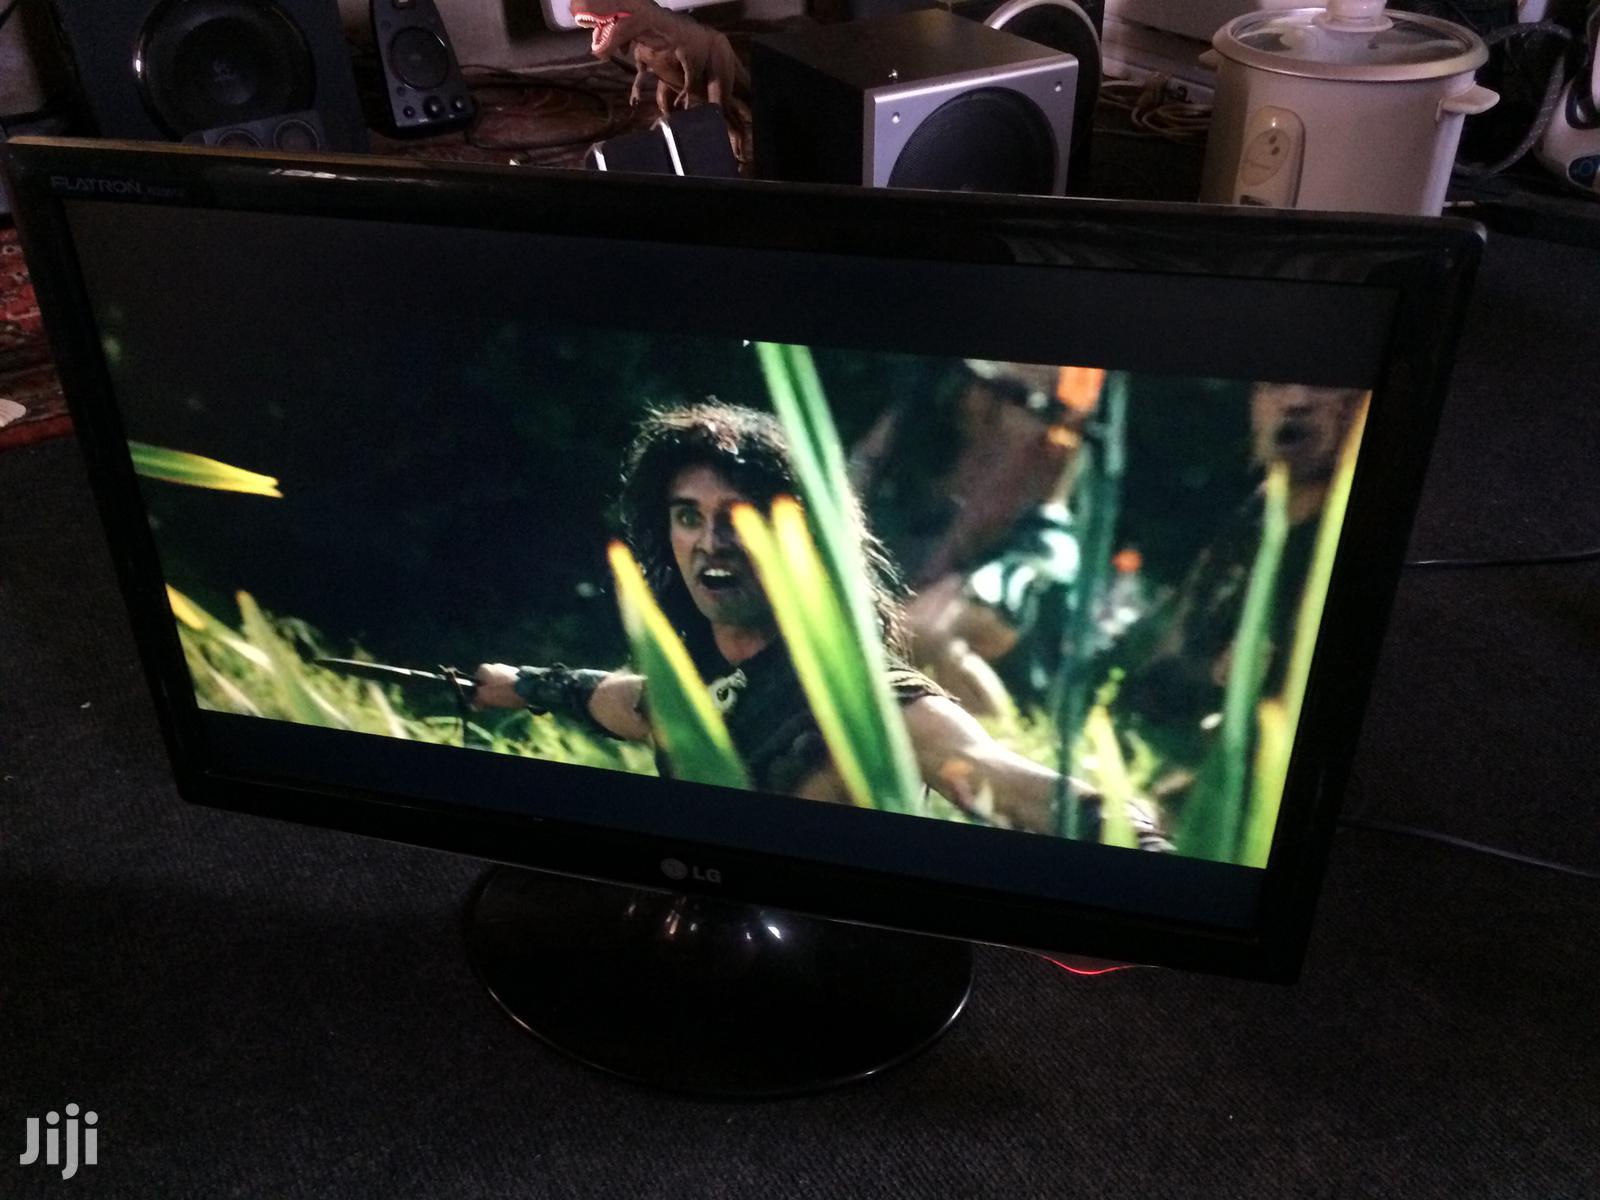 LG Flatron W 2361 V Monitor   Computer Monitors for sale in Tema Metropolitan, Greater Accra, Ghana